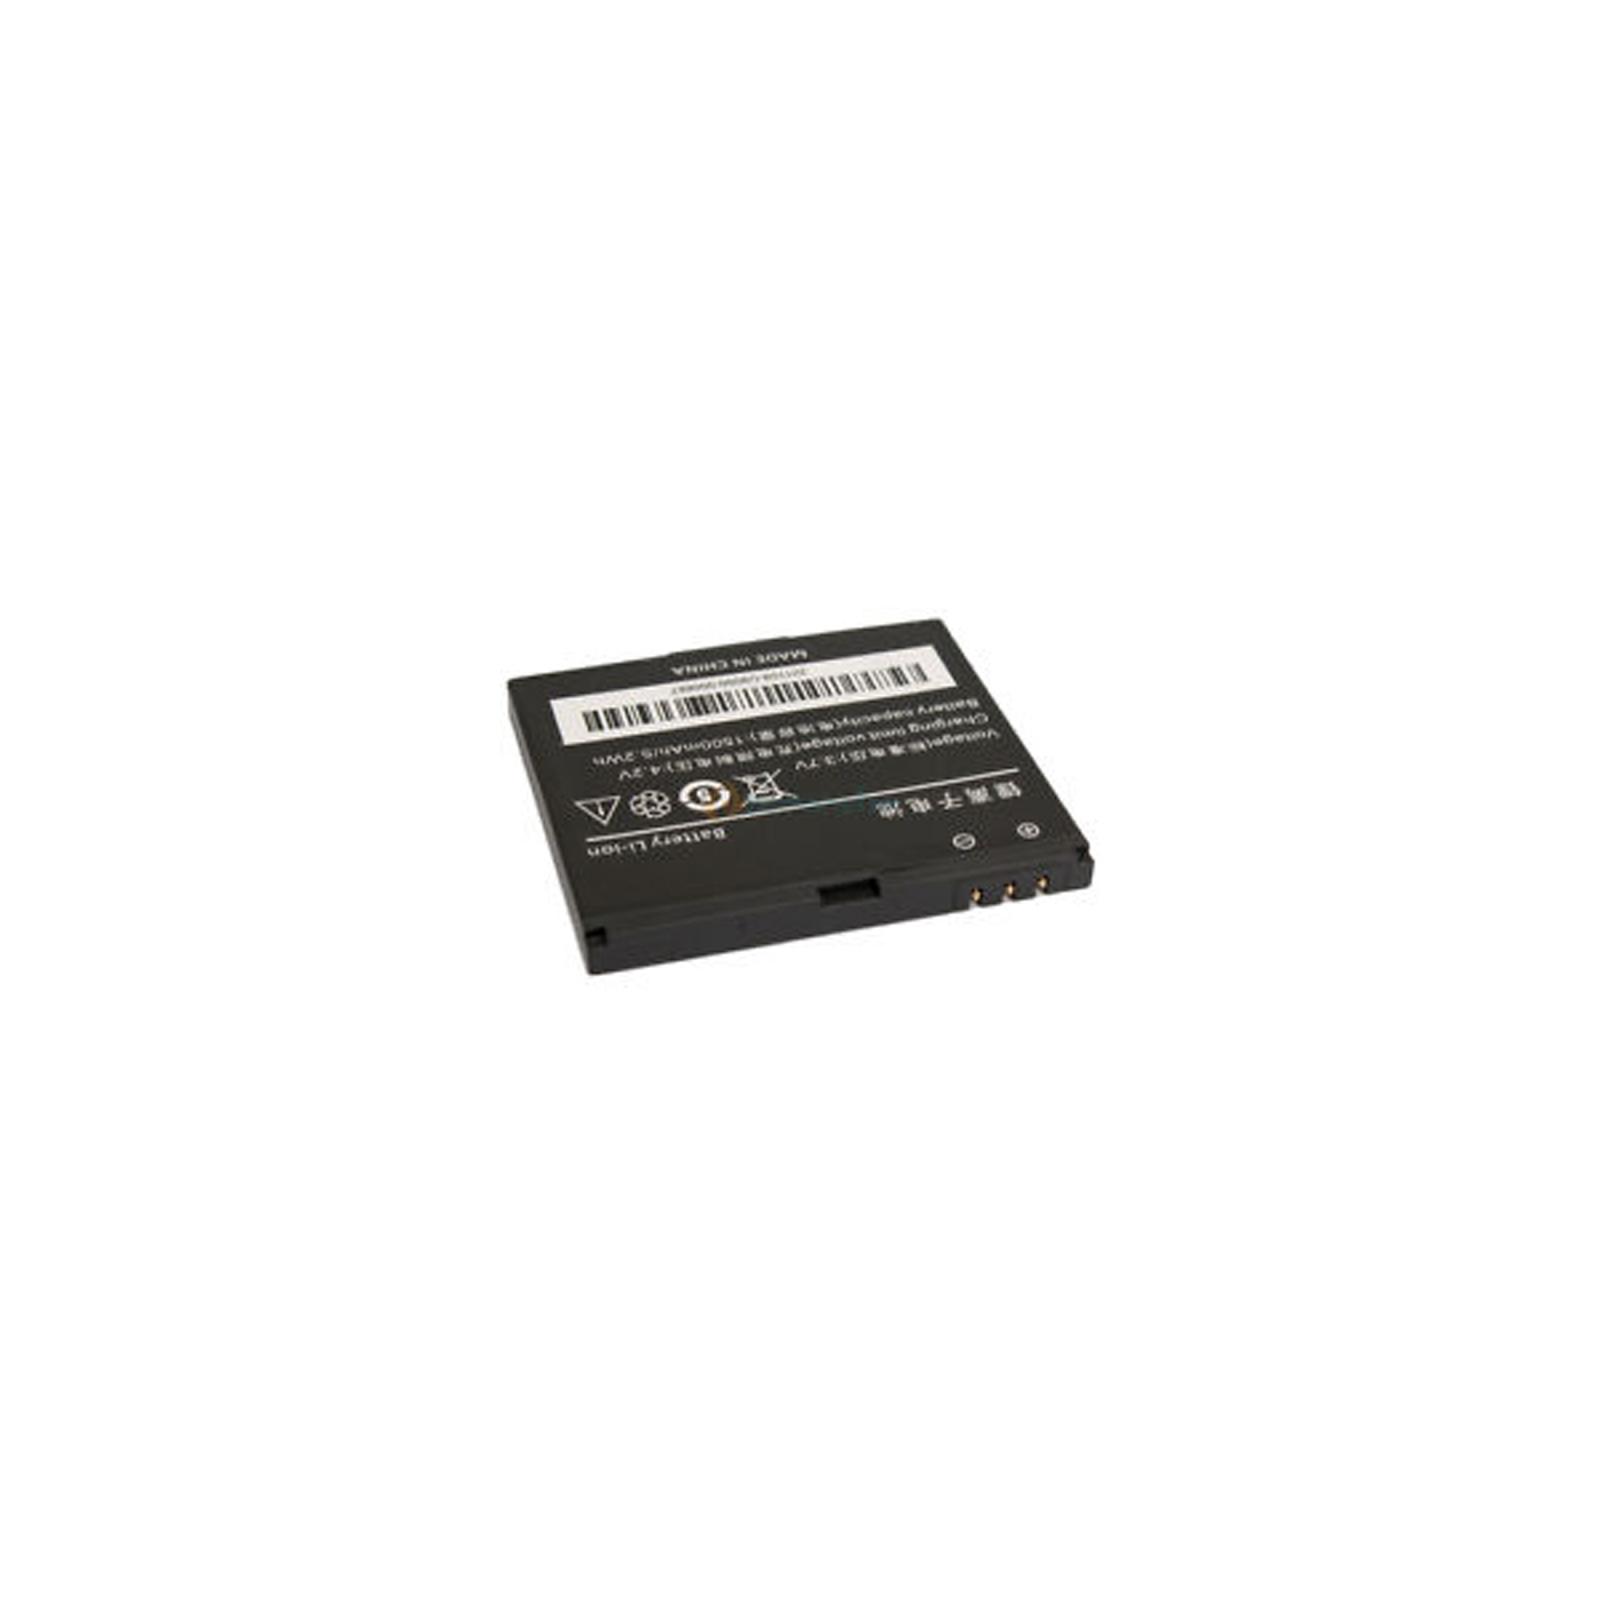 Аккумуляторная батарея PowerPlant Huawei U9000, Motorola Triumph WX435 (DV00DV6109)